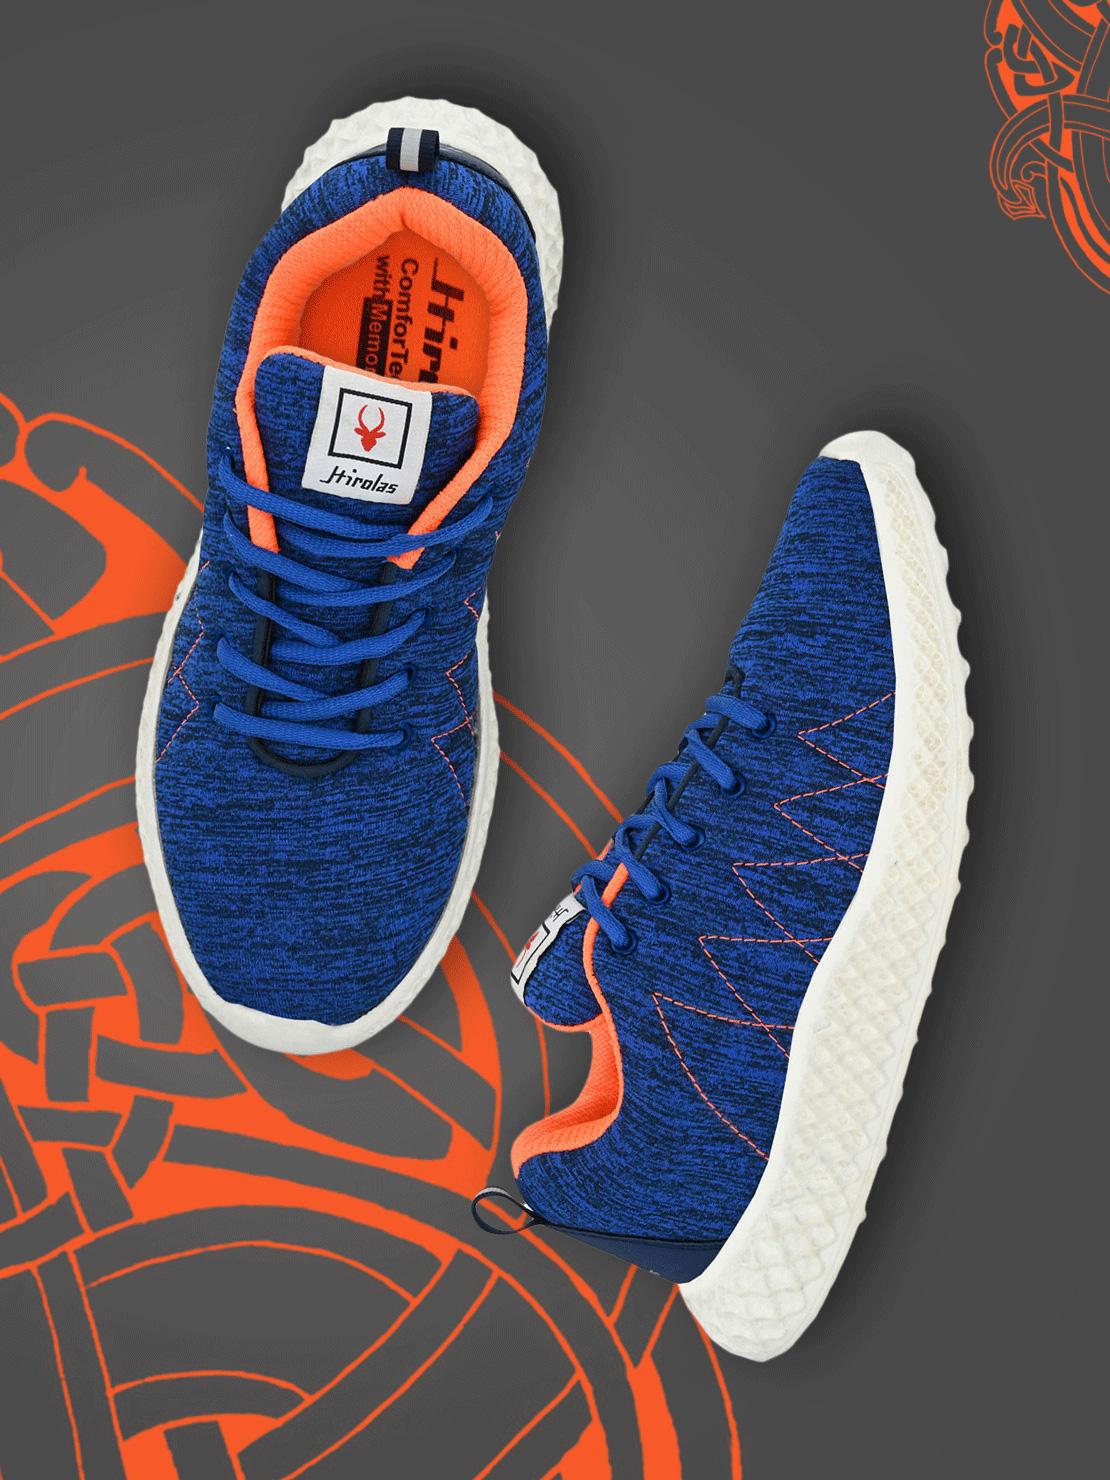 Hirolas | Hirolas® Men's Mesh Blue Walking/Running/Gym Sports Sneaker Shoes